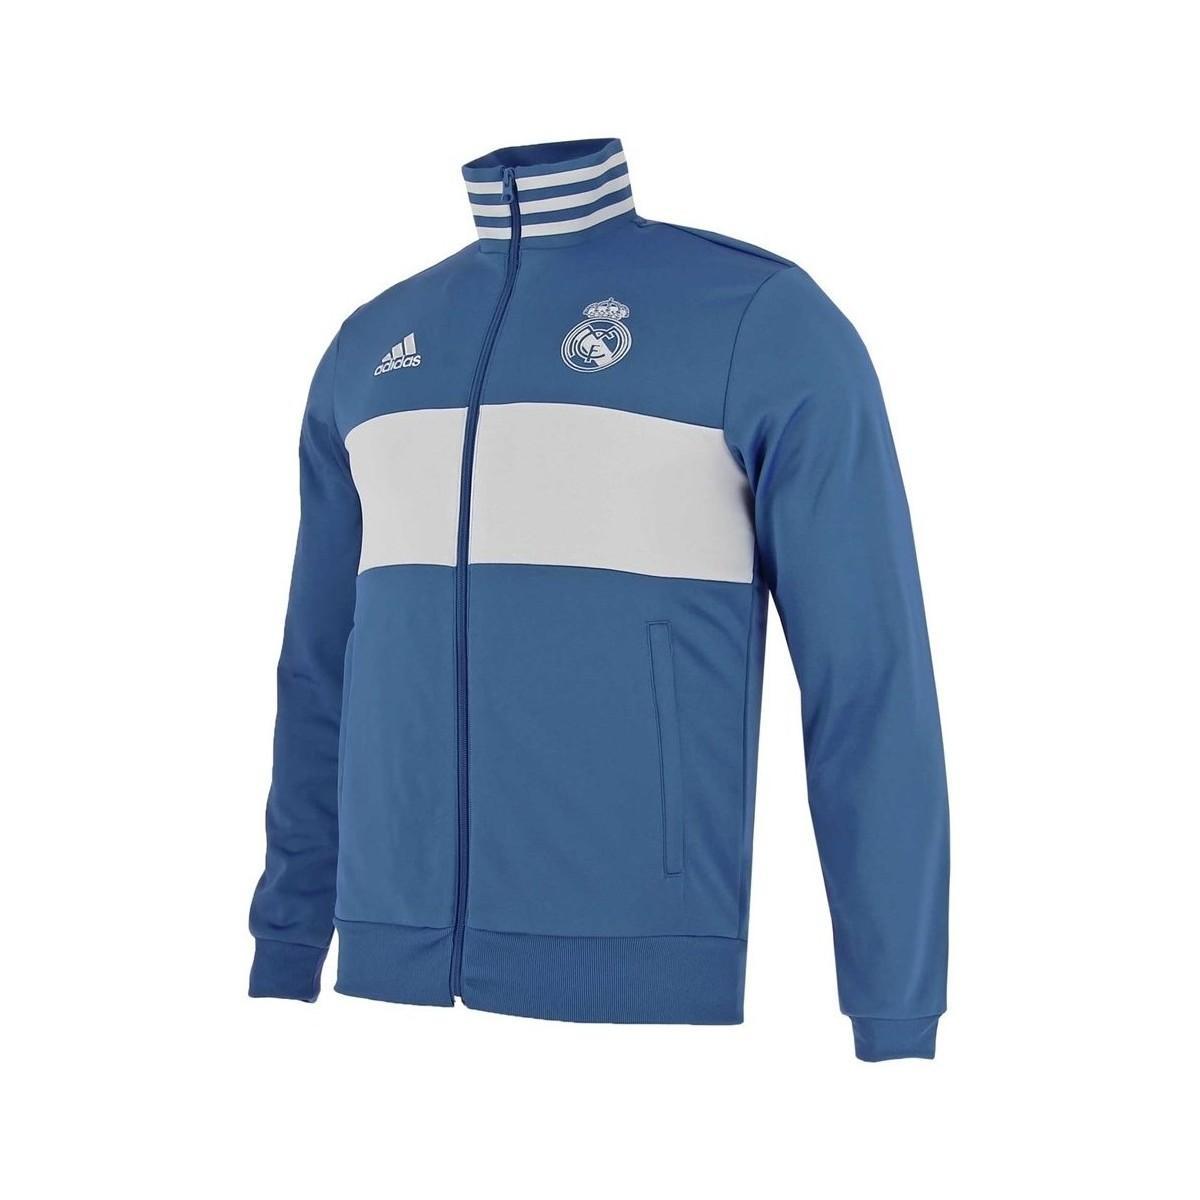 8797458895f Adidas Real Madrid 3stripes Track Jacket Men's Sweatshirt In Blue in ...